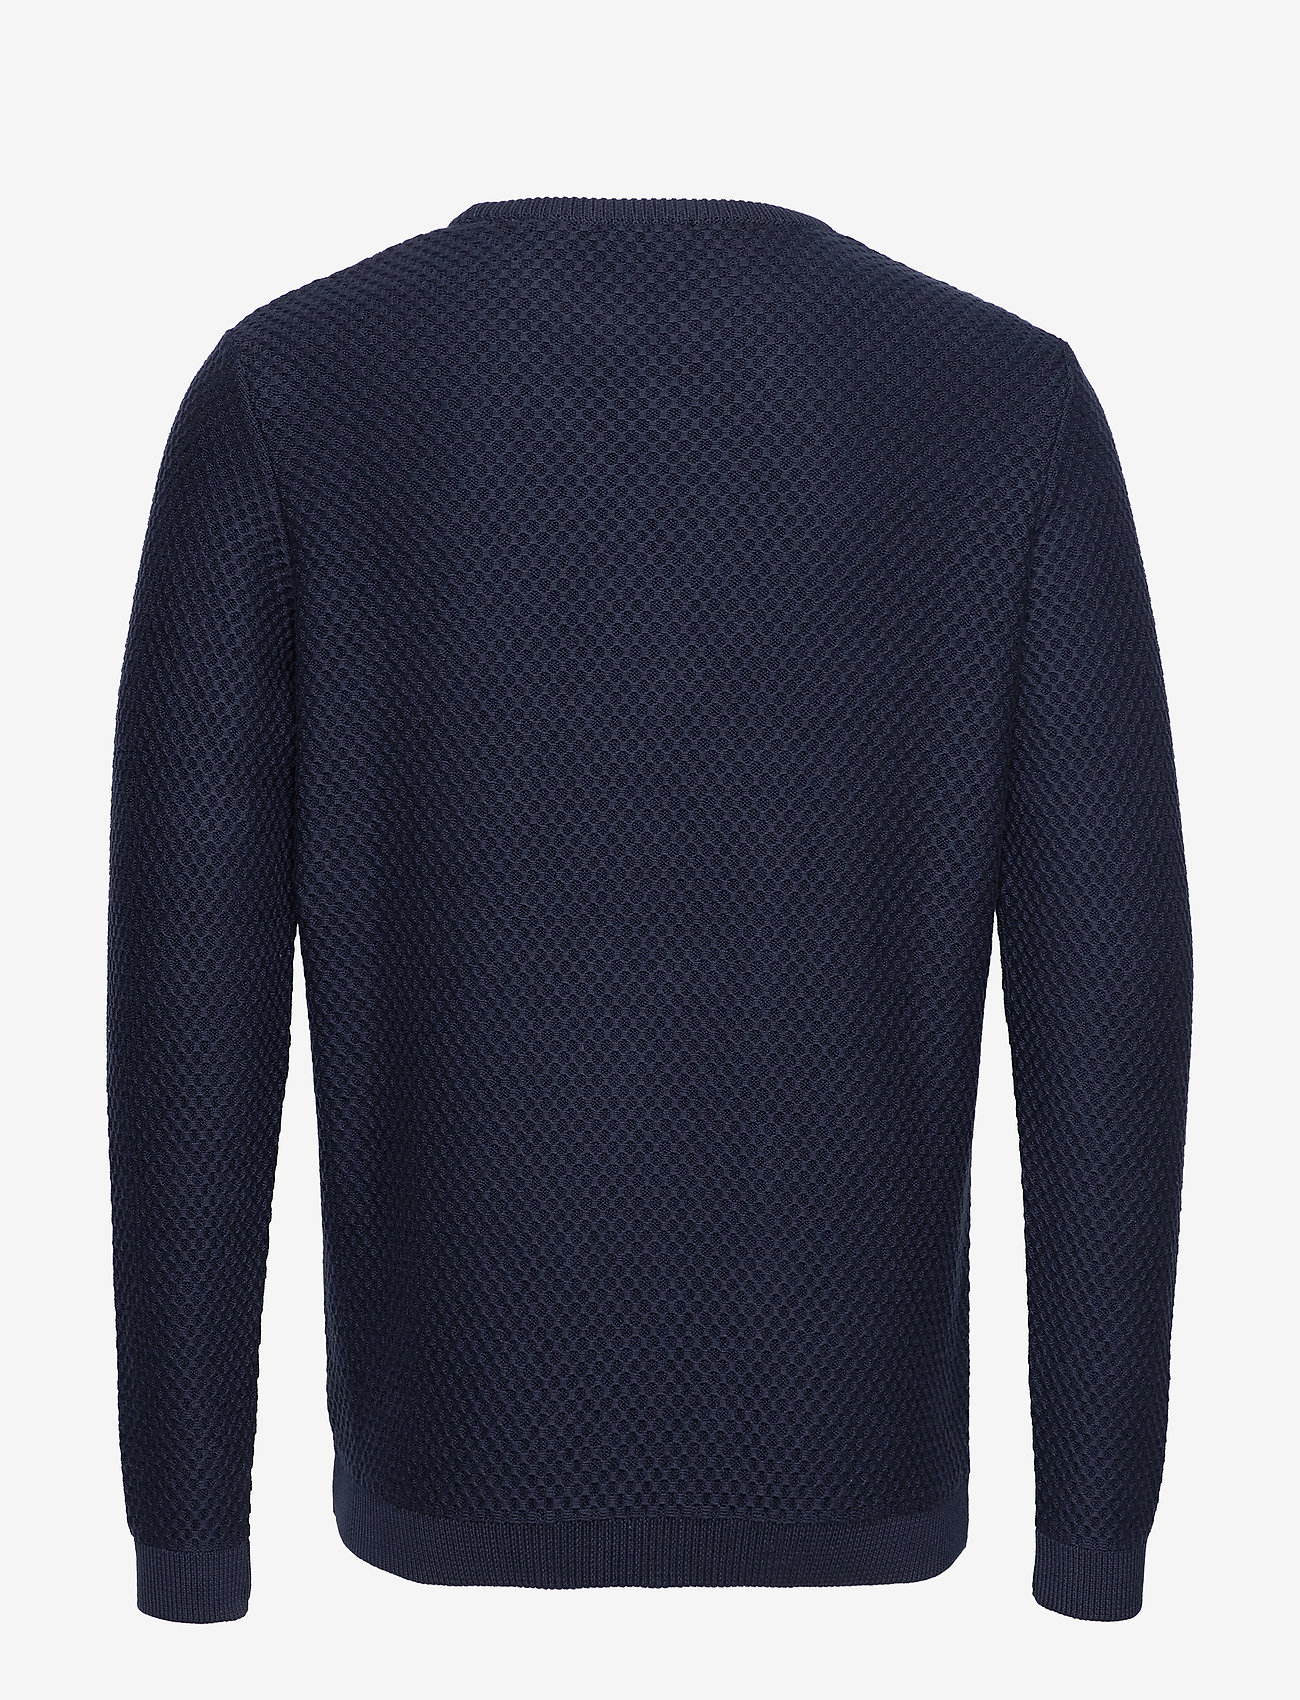 Knowledge Cotton Apparel FIELD crew neck knit - GOTS/Vegan - Strikkevarer TOTAL ECLIPSE - Menn Klær